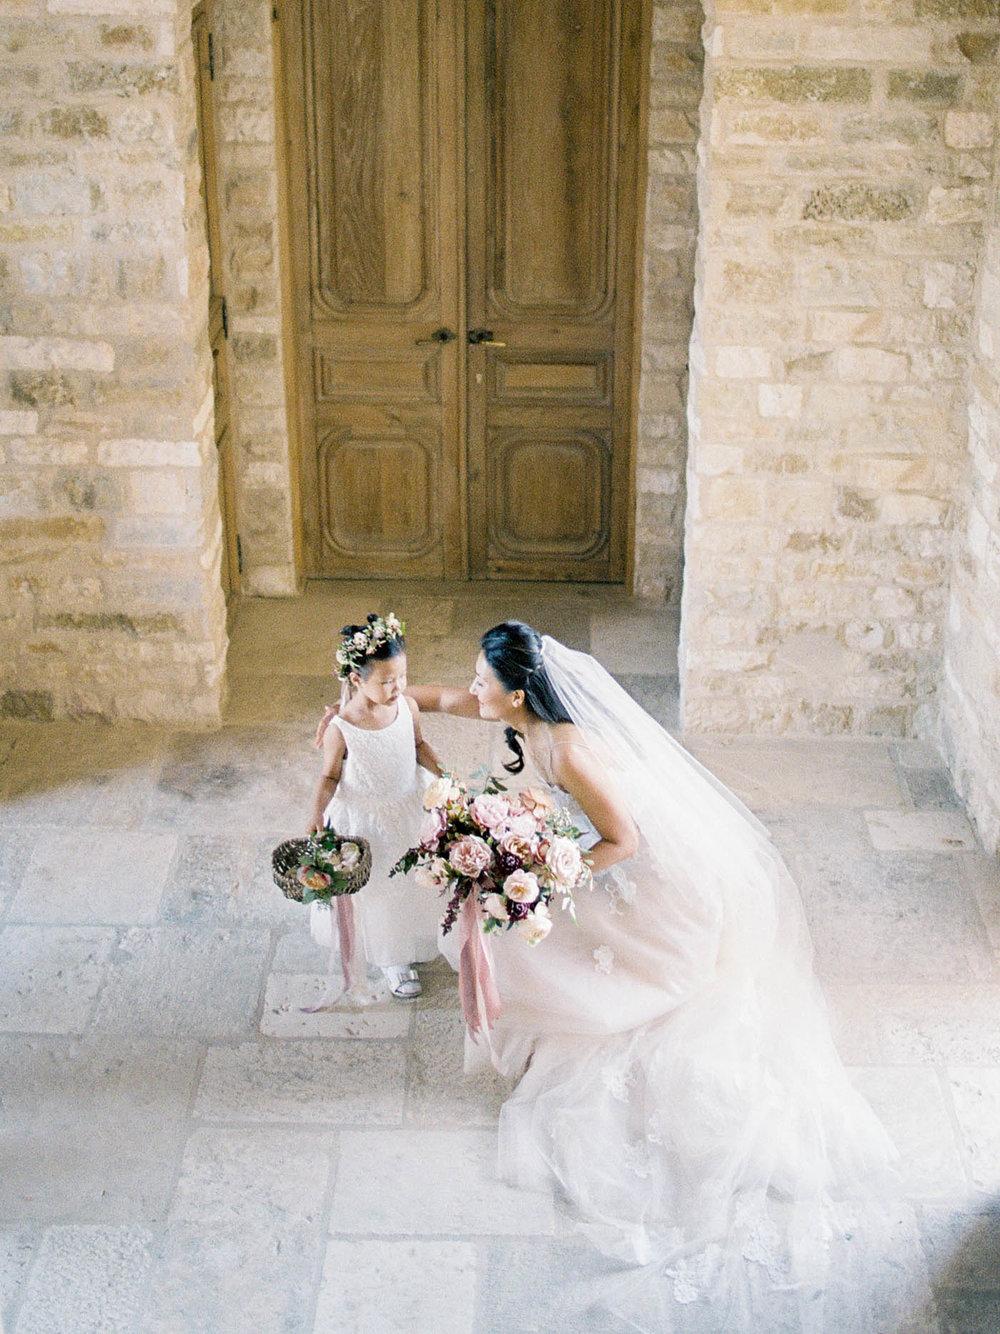 sunstone-villa-wedding-11-Jen_Huang-RD-48-Jen_Huang-009572-R1-026.jpg